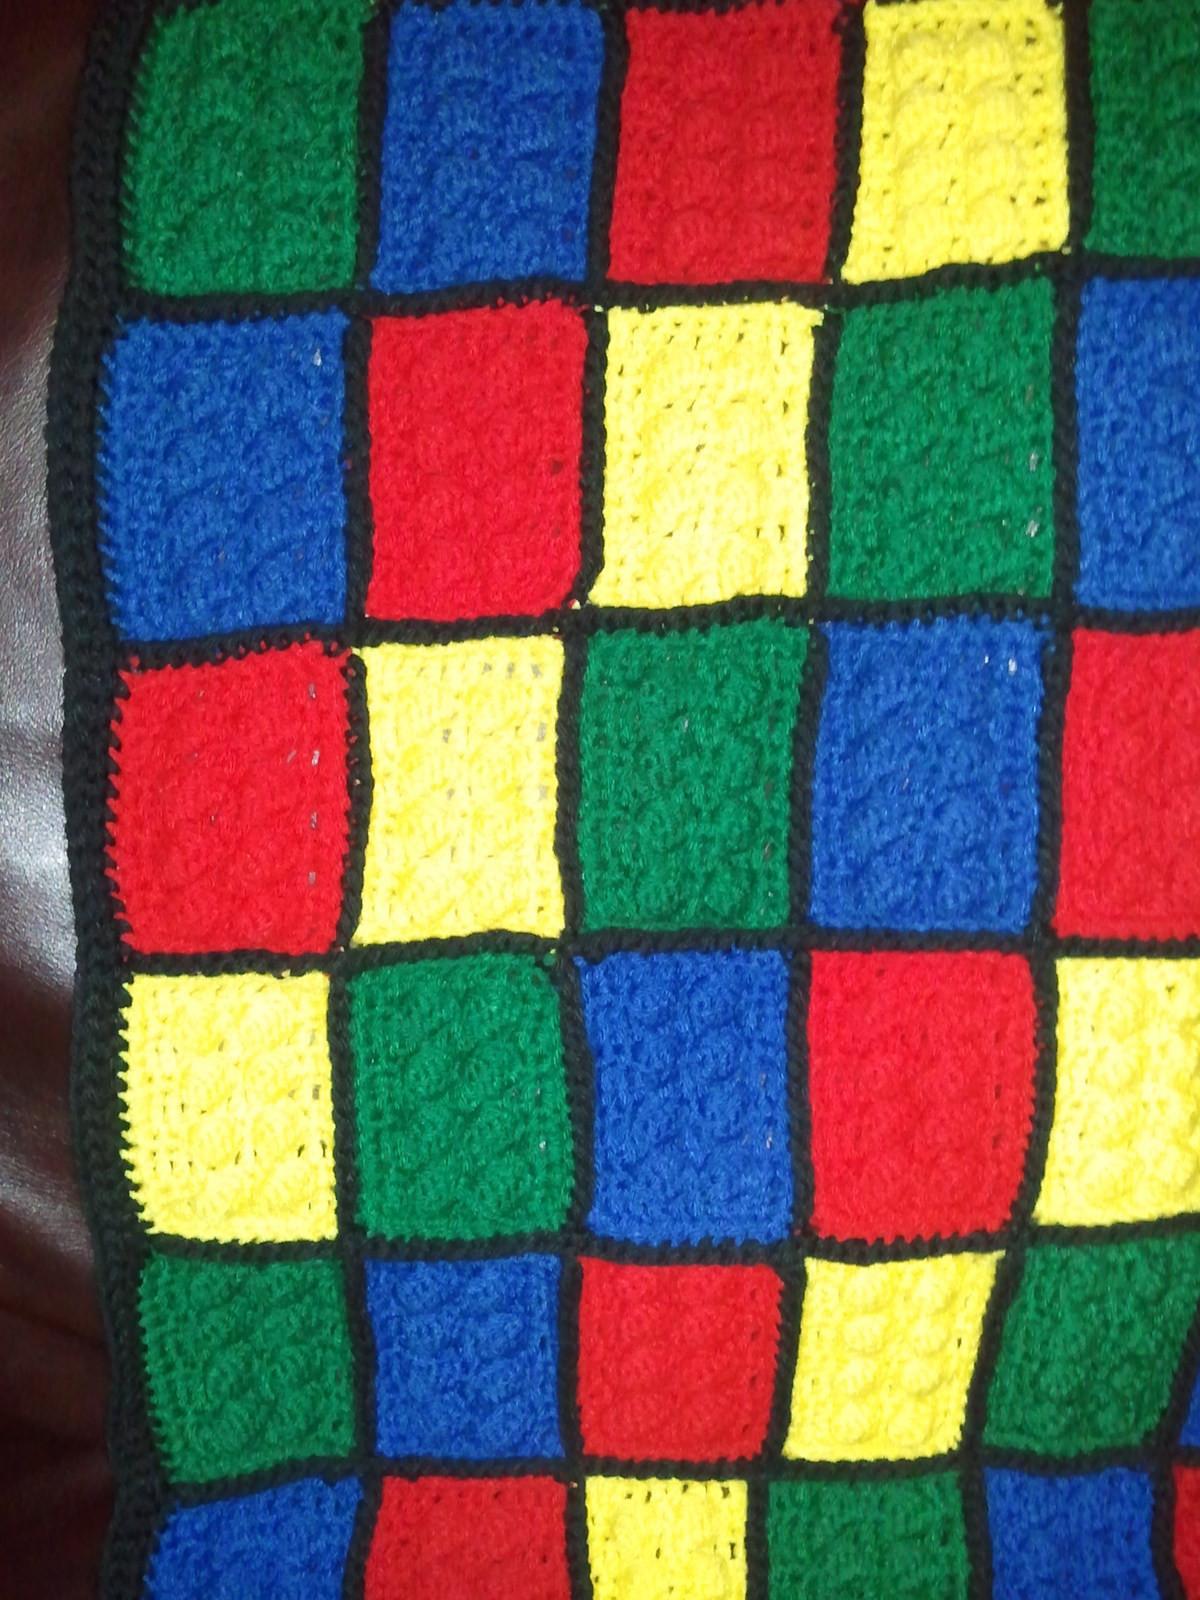 Crochet Lego Throw Blanket A Throw Crochet On Cut Out